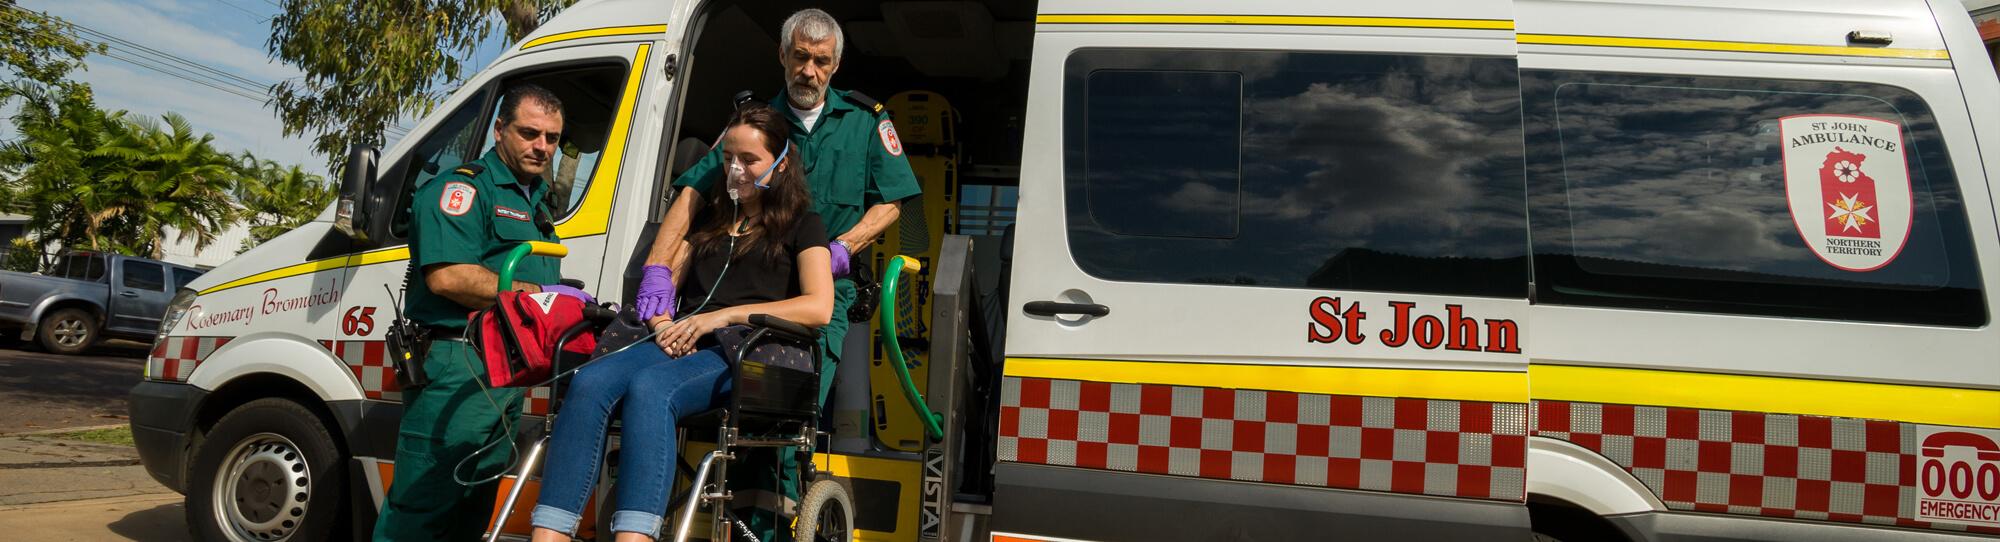 St John - Ambulance Careers with St John